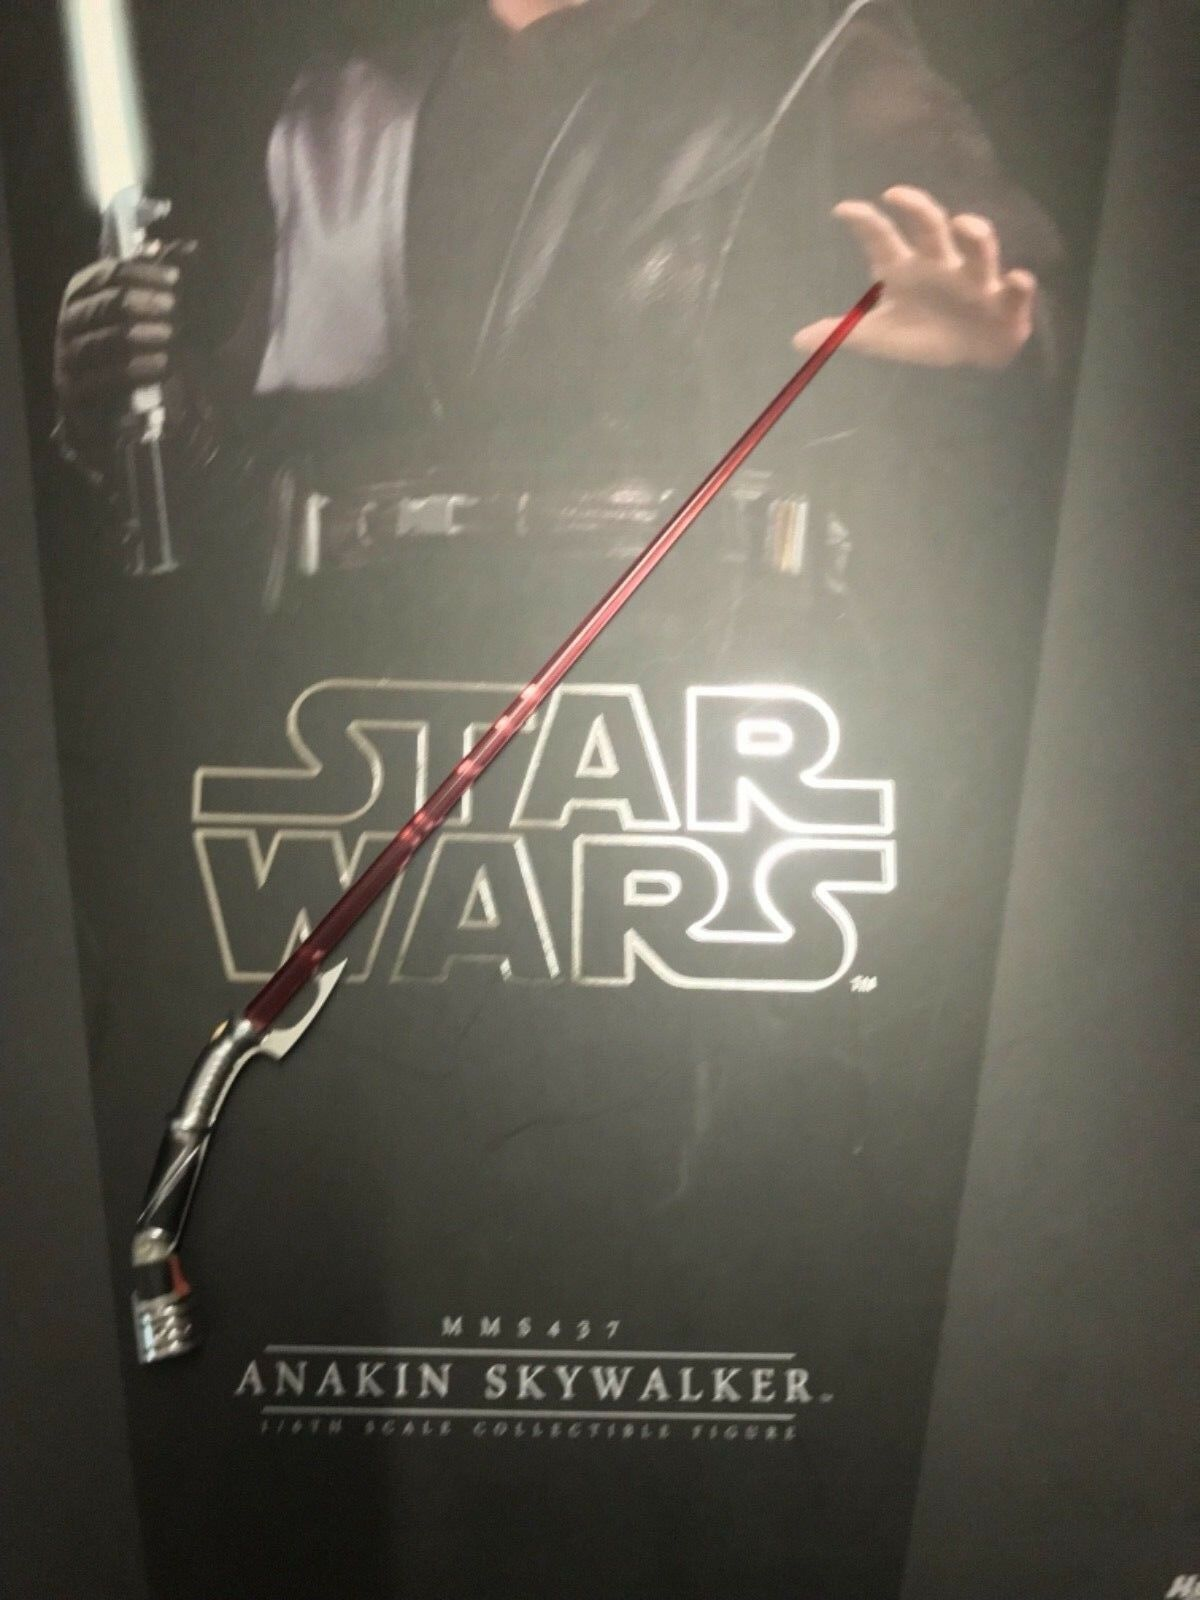 Calientegiocattoli estrella guerras Revenge Of The Sith  Anakin cielowalker  MMS437 - Dooku Saber set  a prezzi accessibili